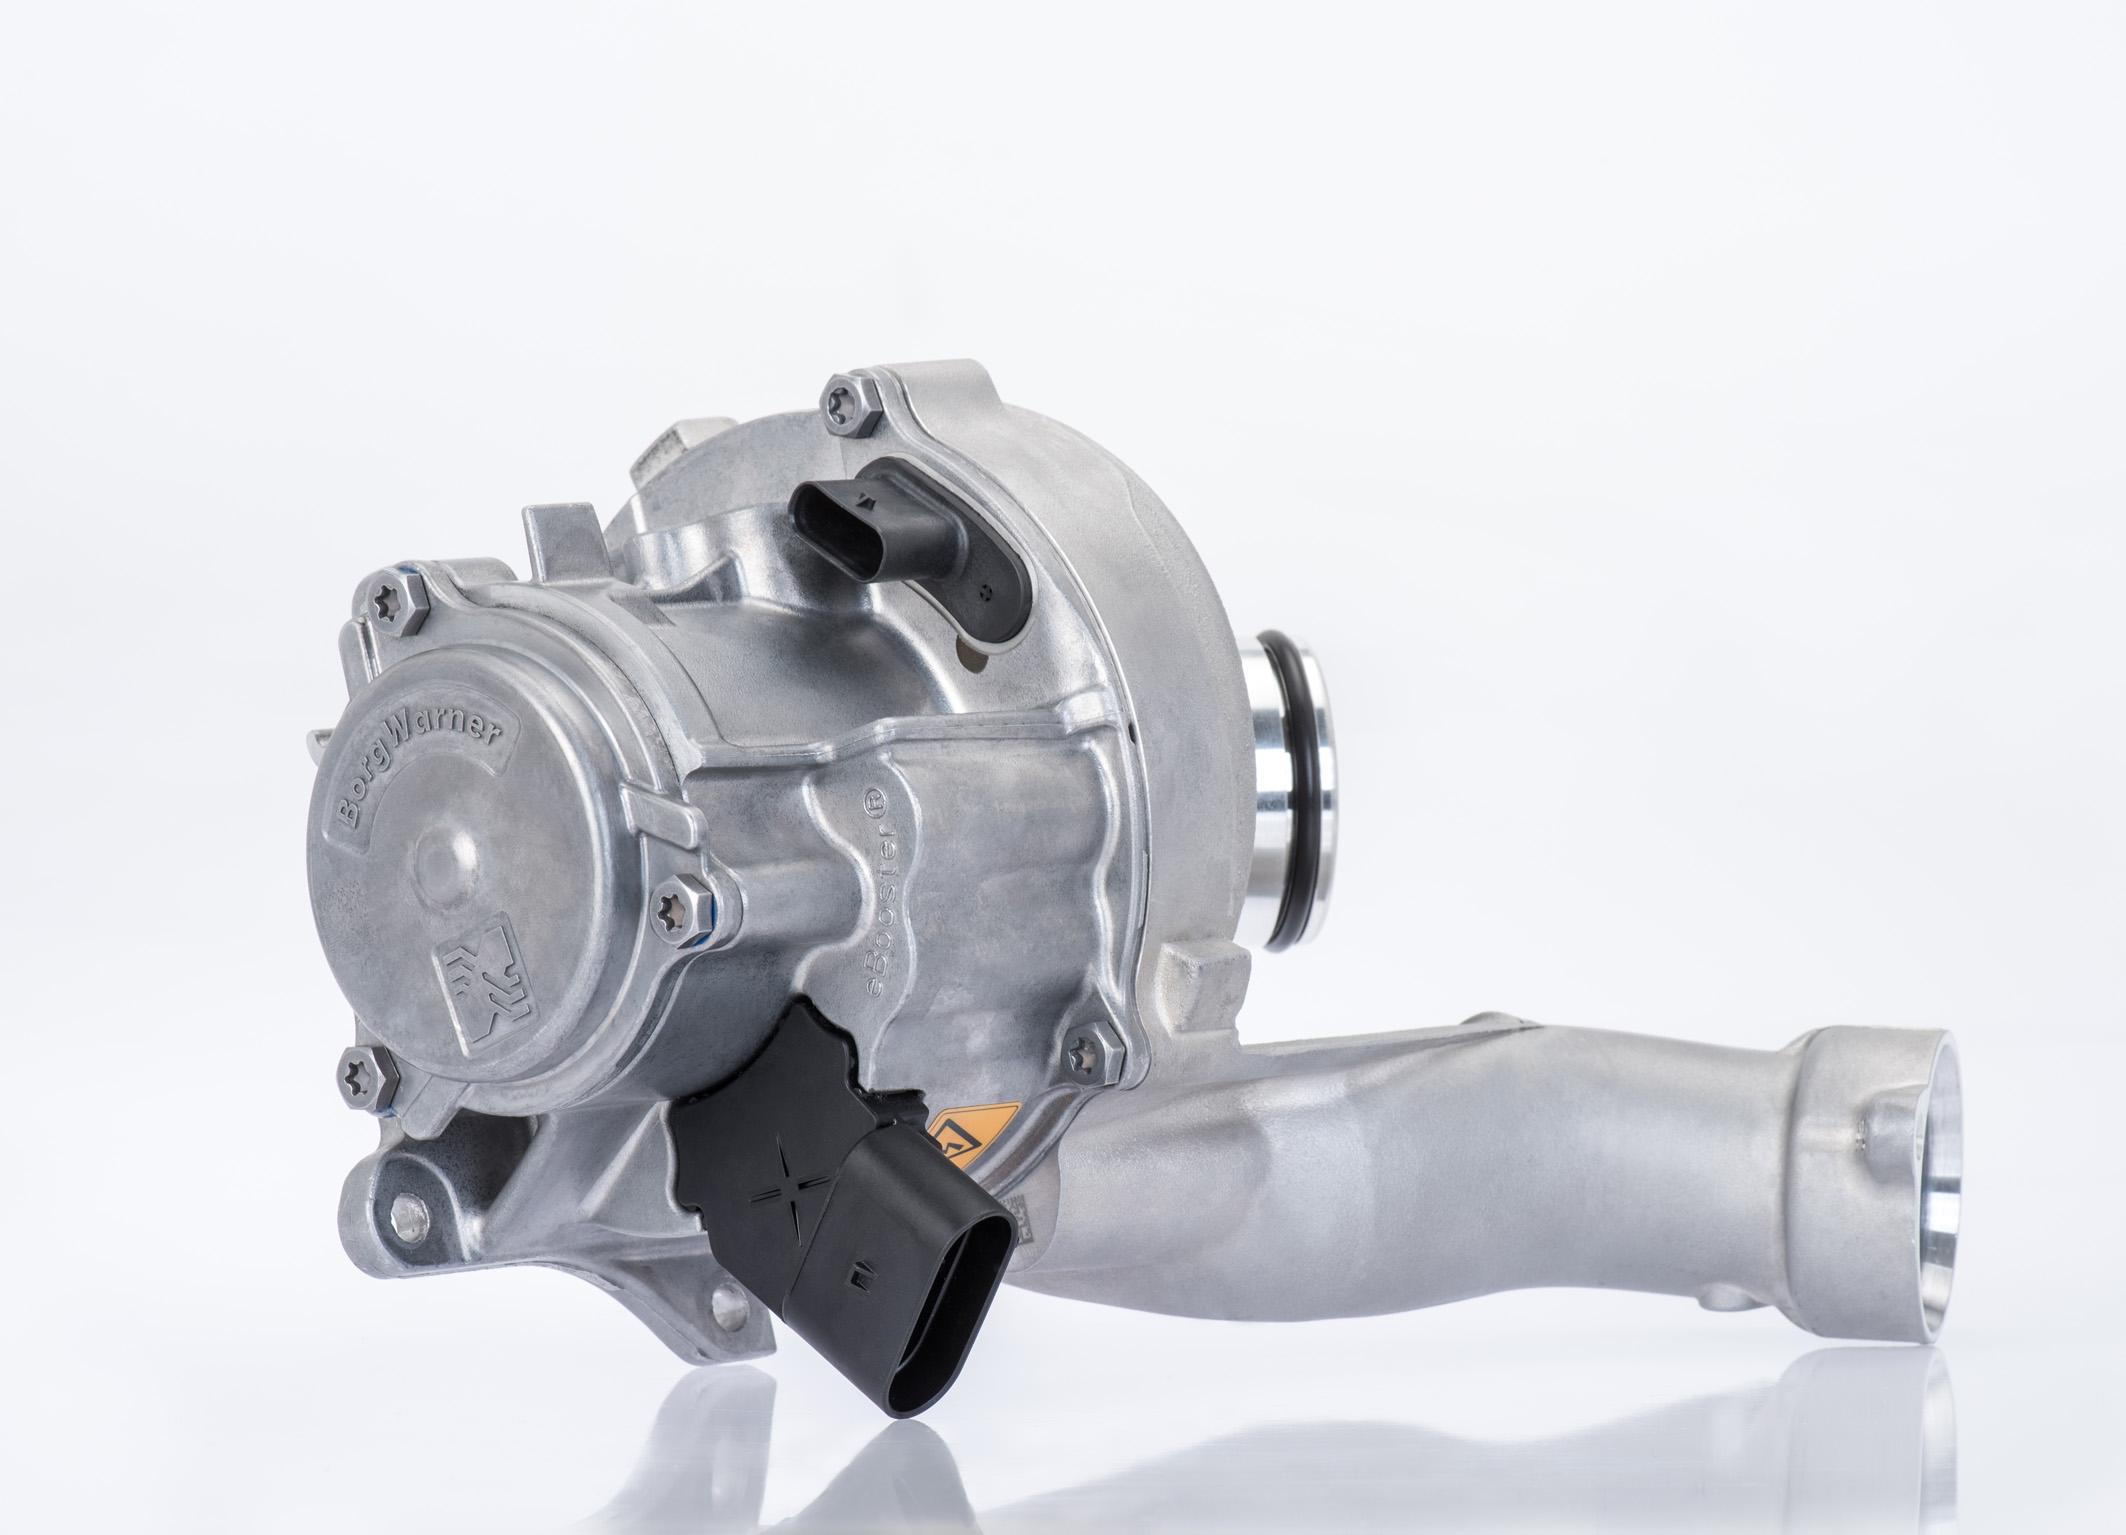 Borgwarner S Ebooster 174 Electrically Driven Compressor